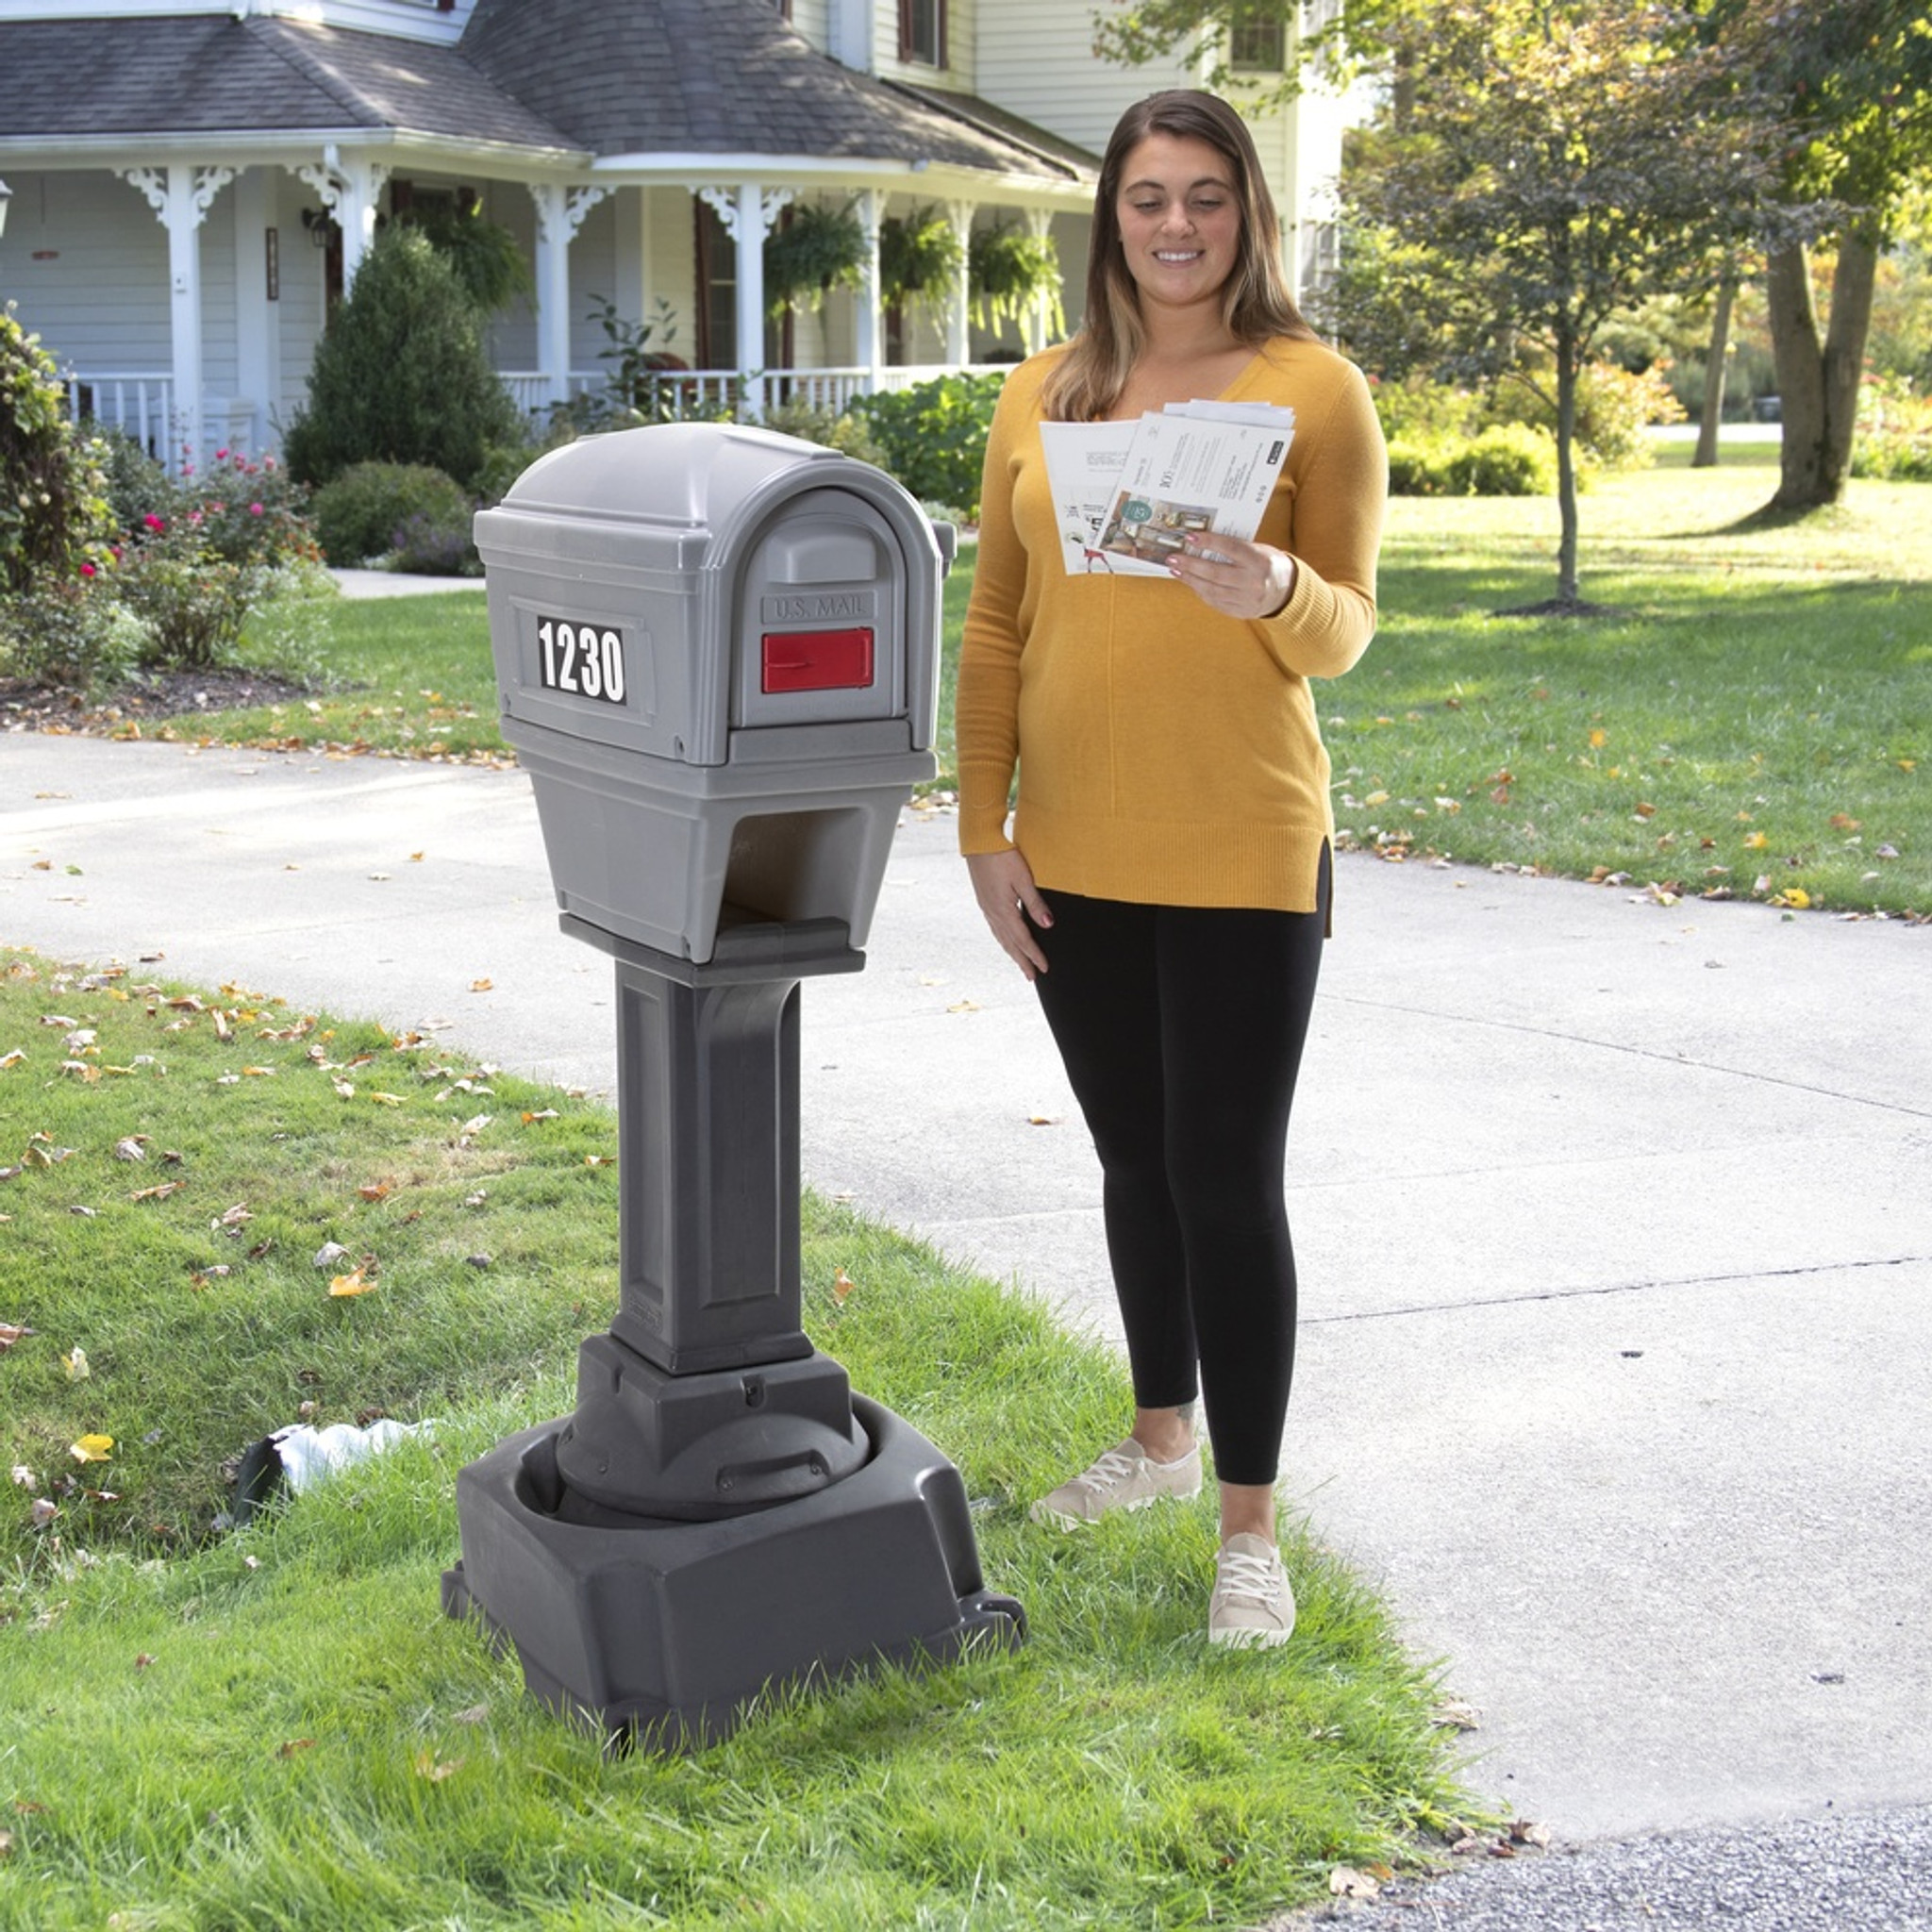 Dig Free True Level Mailbox With Newspaper Holder